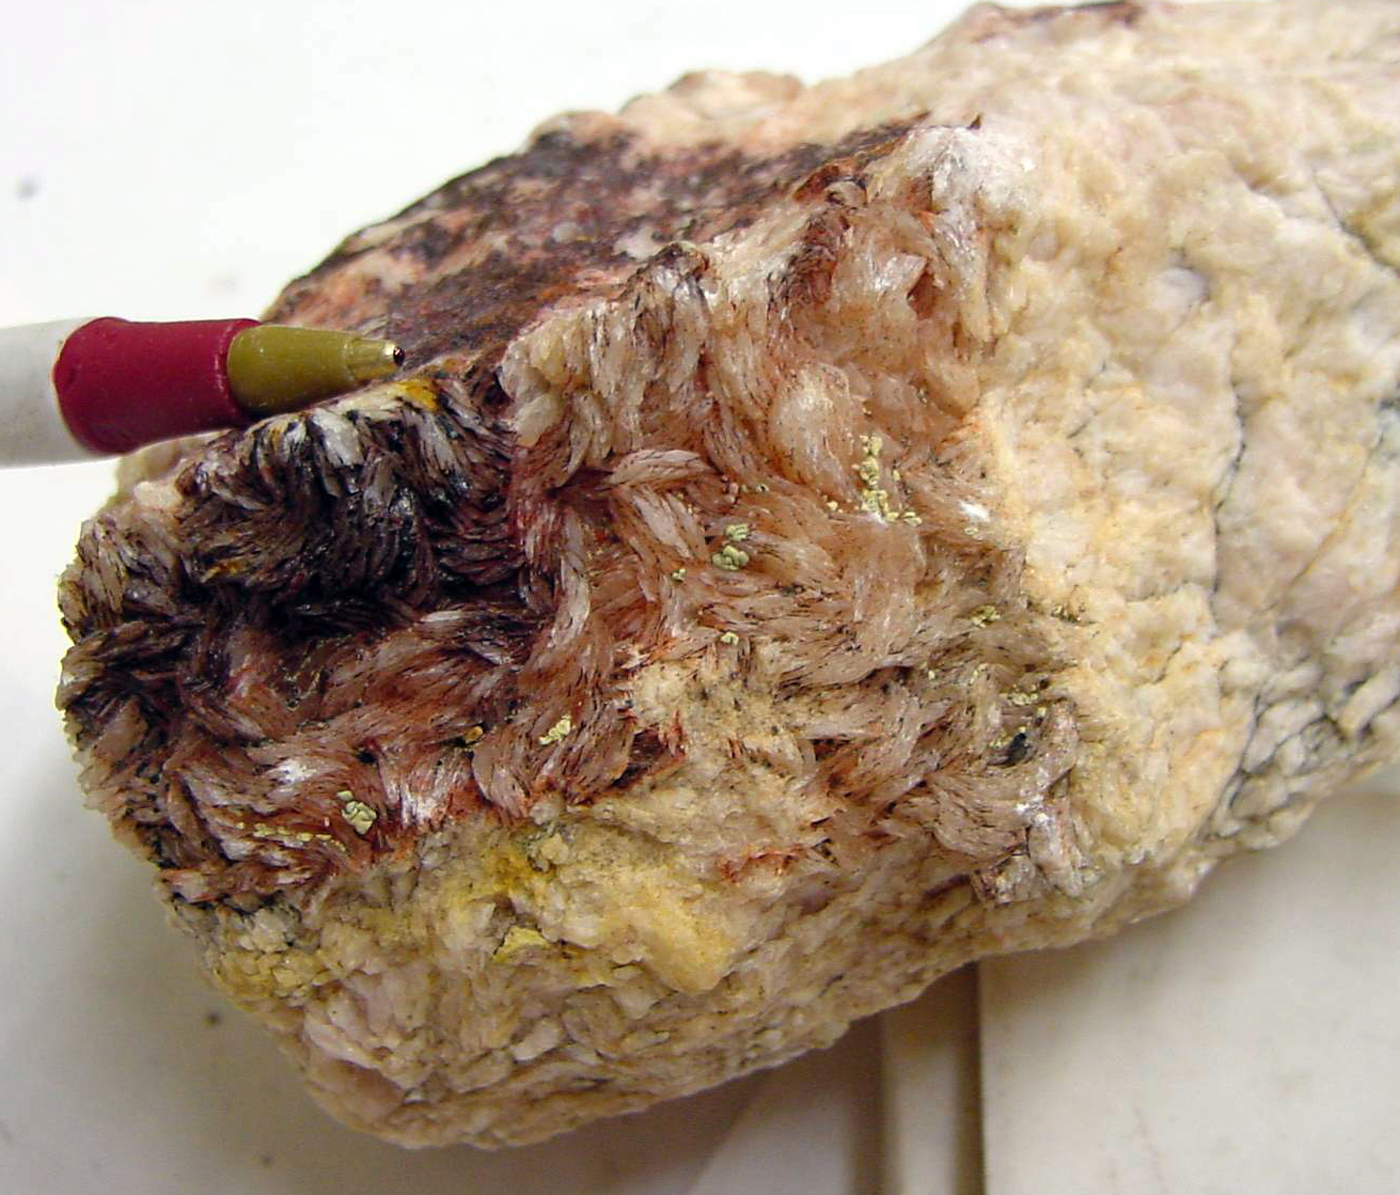 Alunite - USGS Mineral Specimens 015.jpg